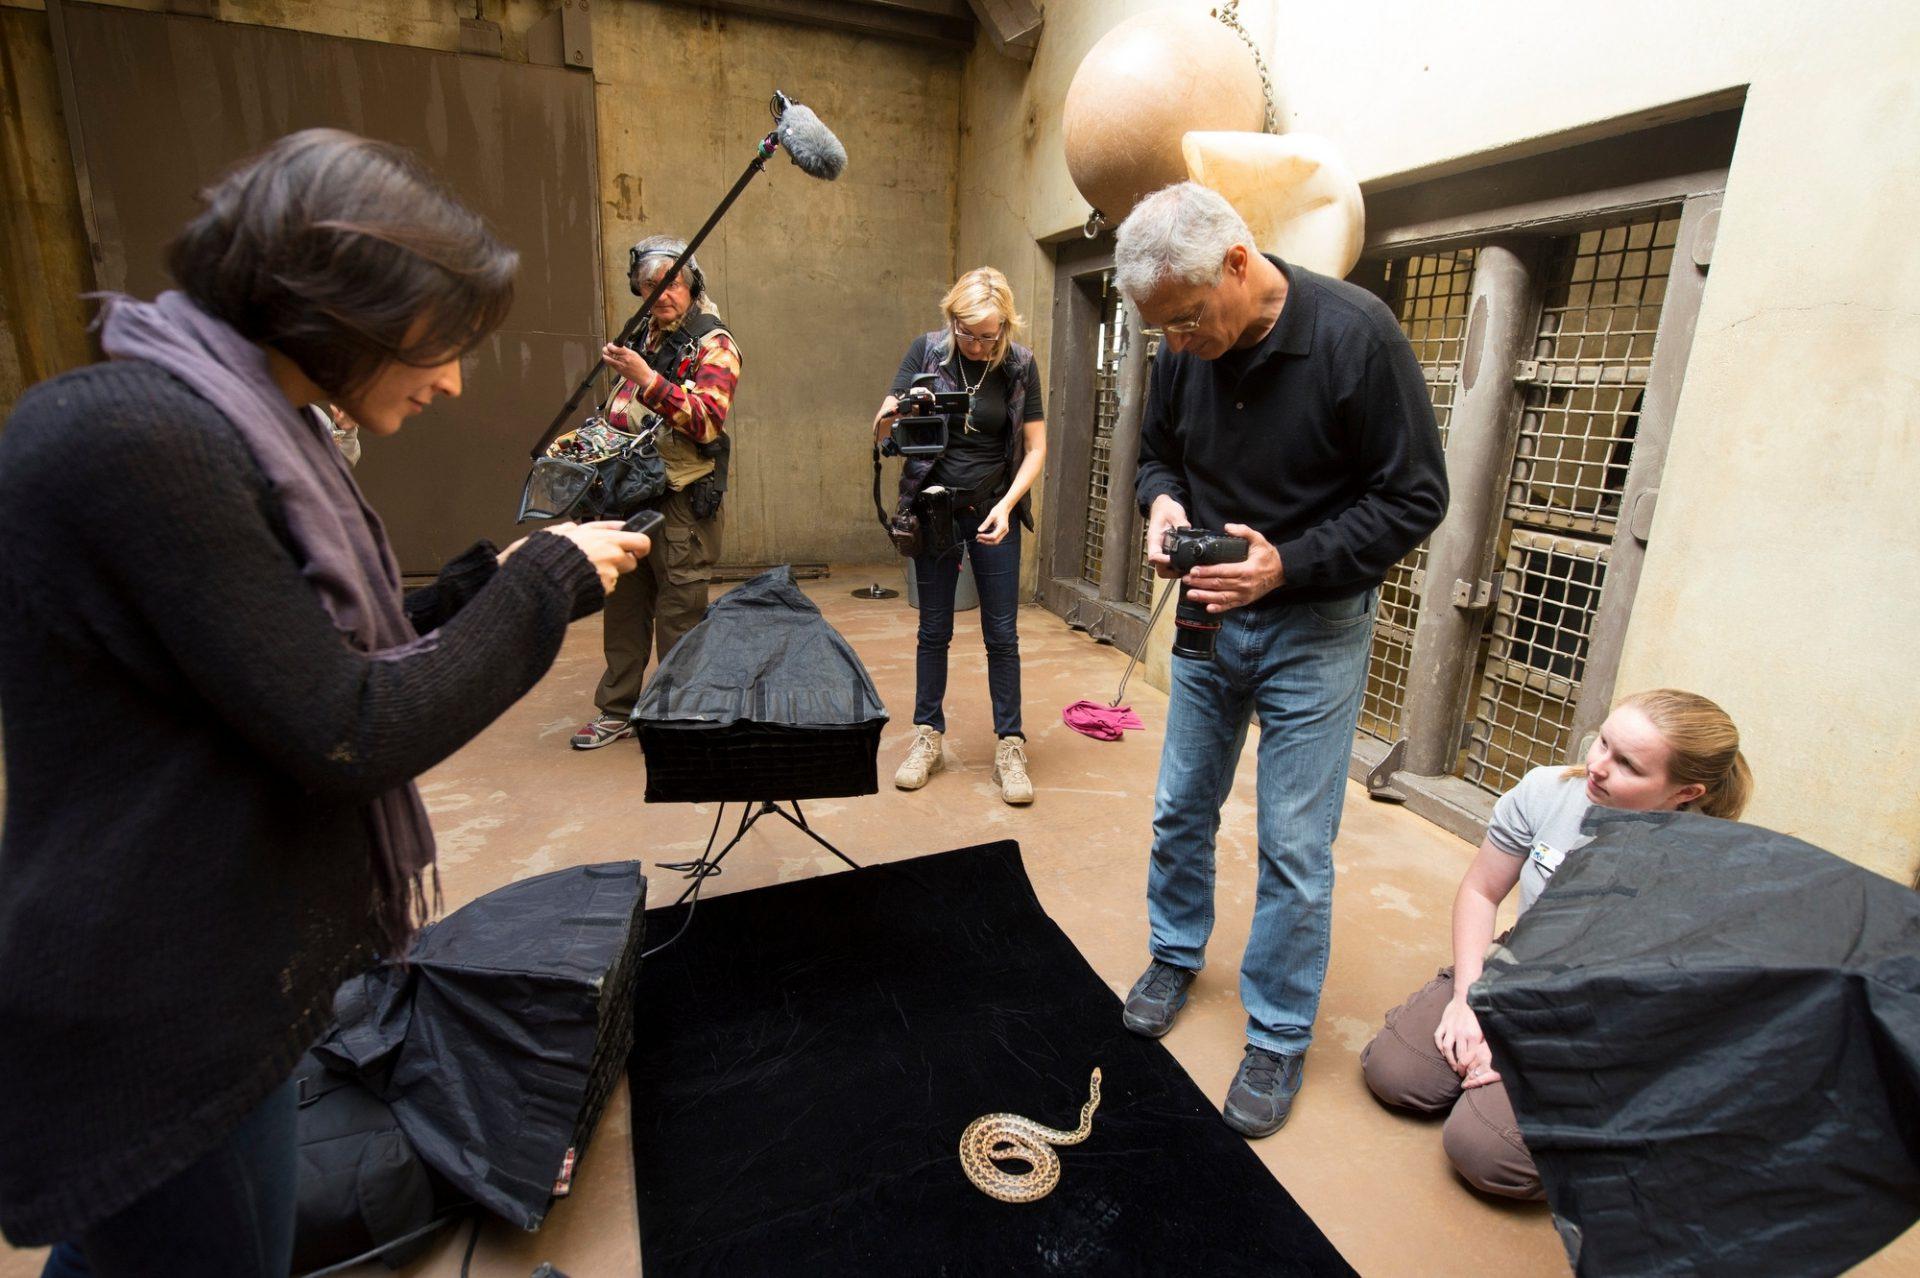 Louie Psihoyos and his crew film the Santa Cruz gopher snake (Pituophis catenifer pumilis) at the Santa Barbara Zoo.